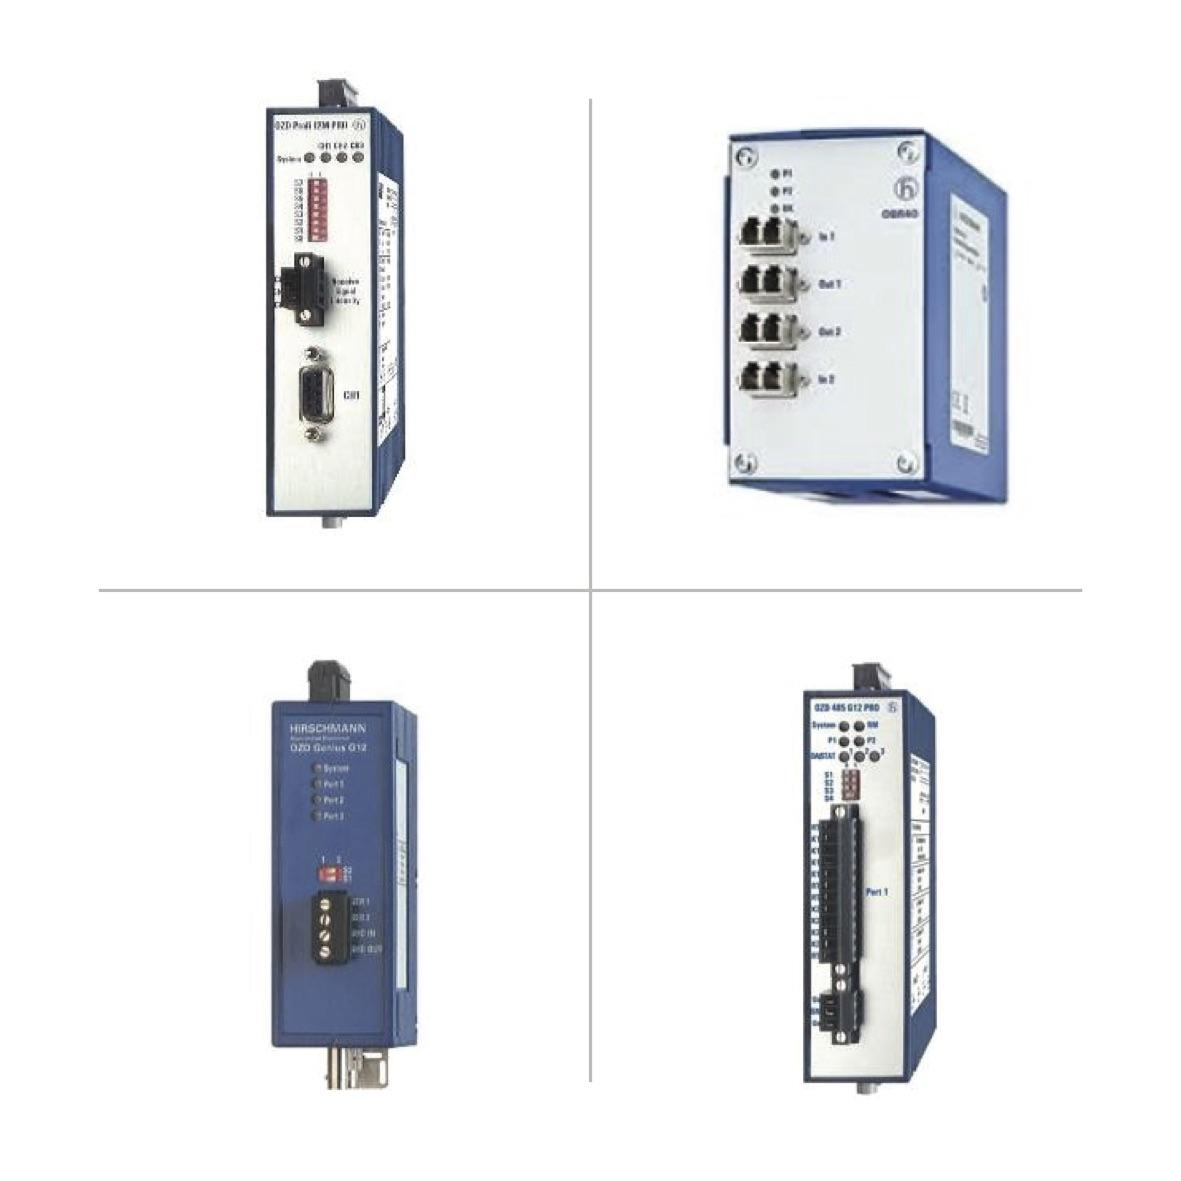 Fibre Interfaces / Bypass Relays